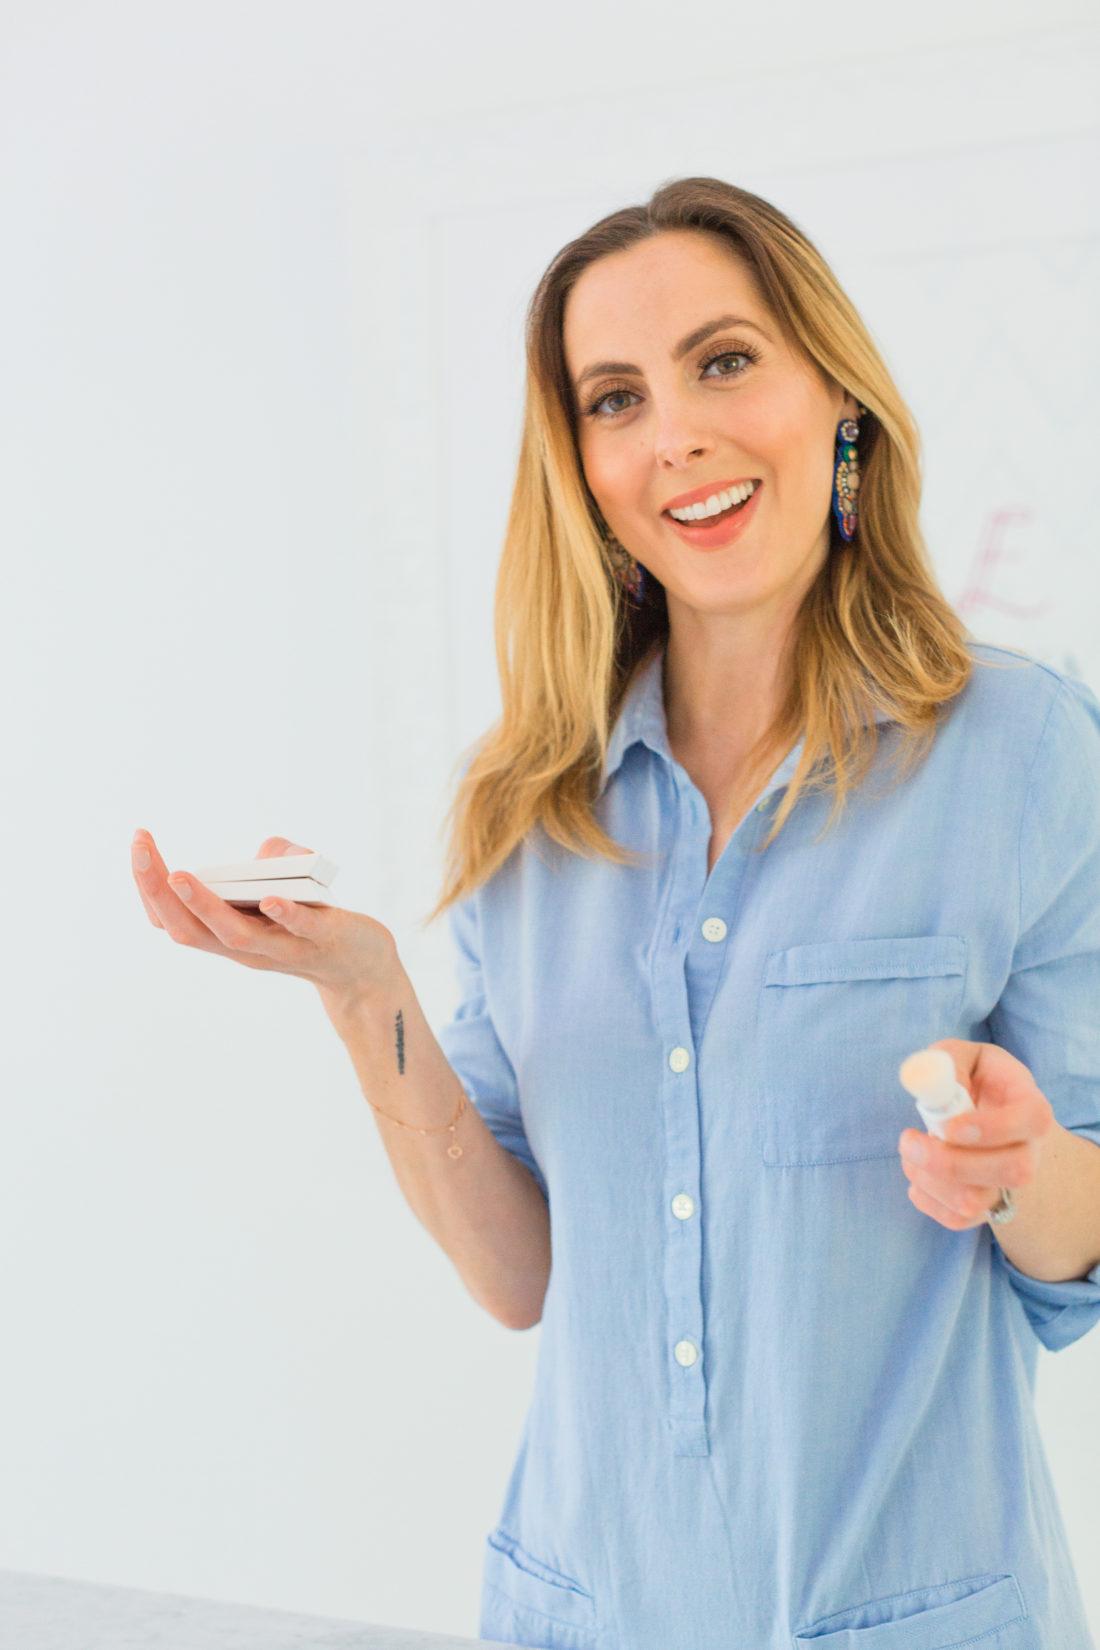 Eva Amurri Martino wears a light blue shirtdress and applies Fenty Beauty blotting powder to her face